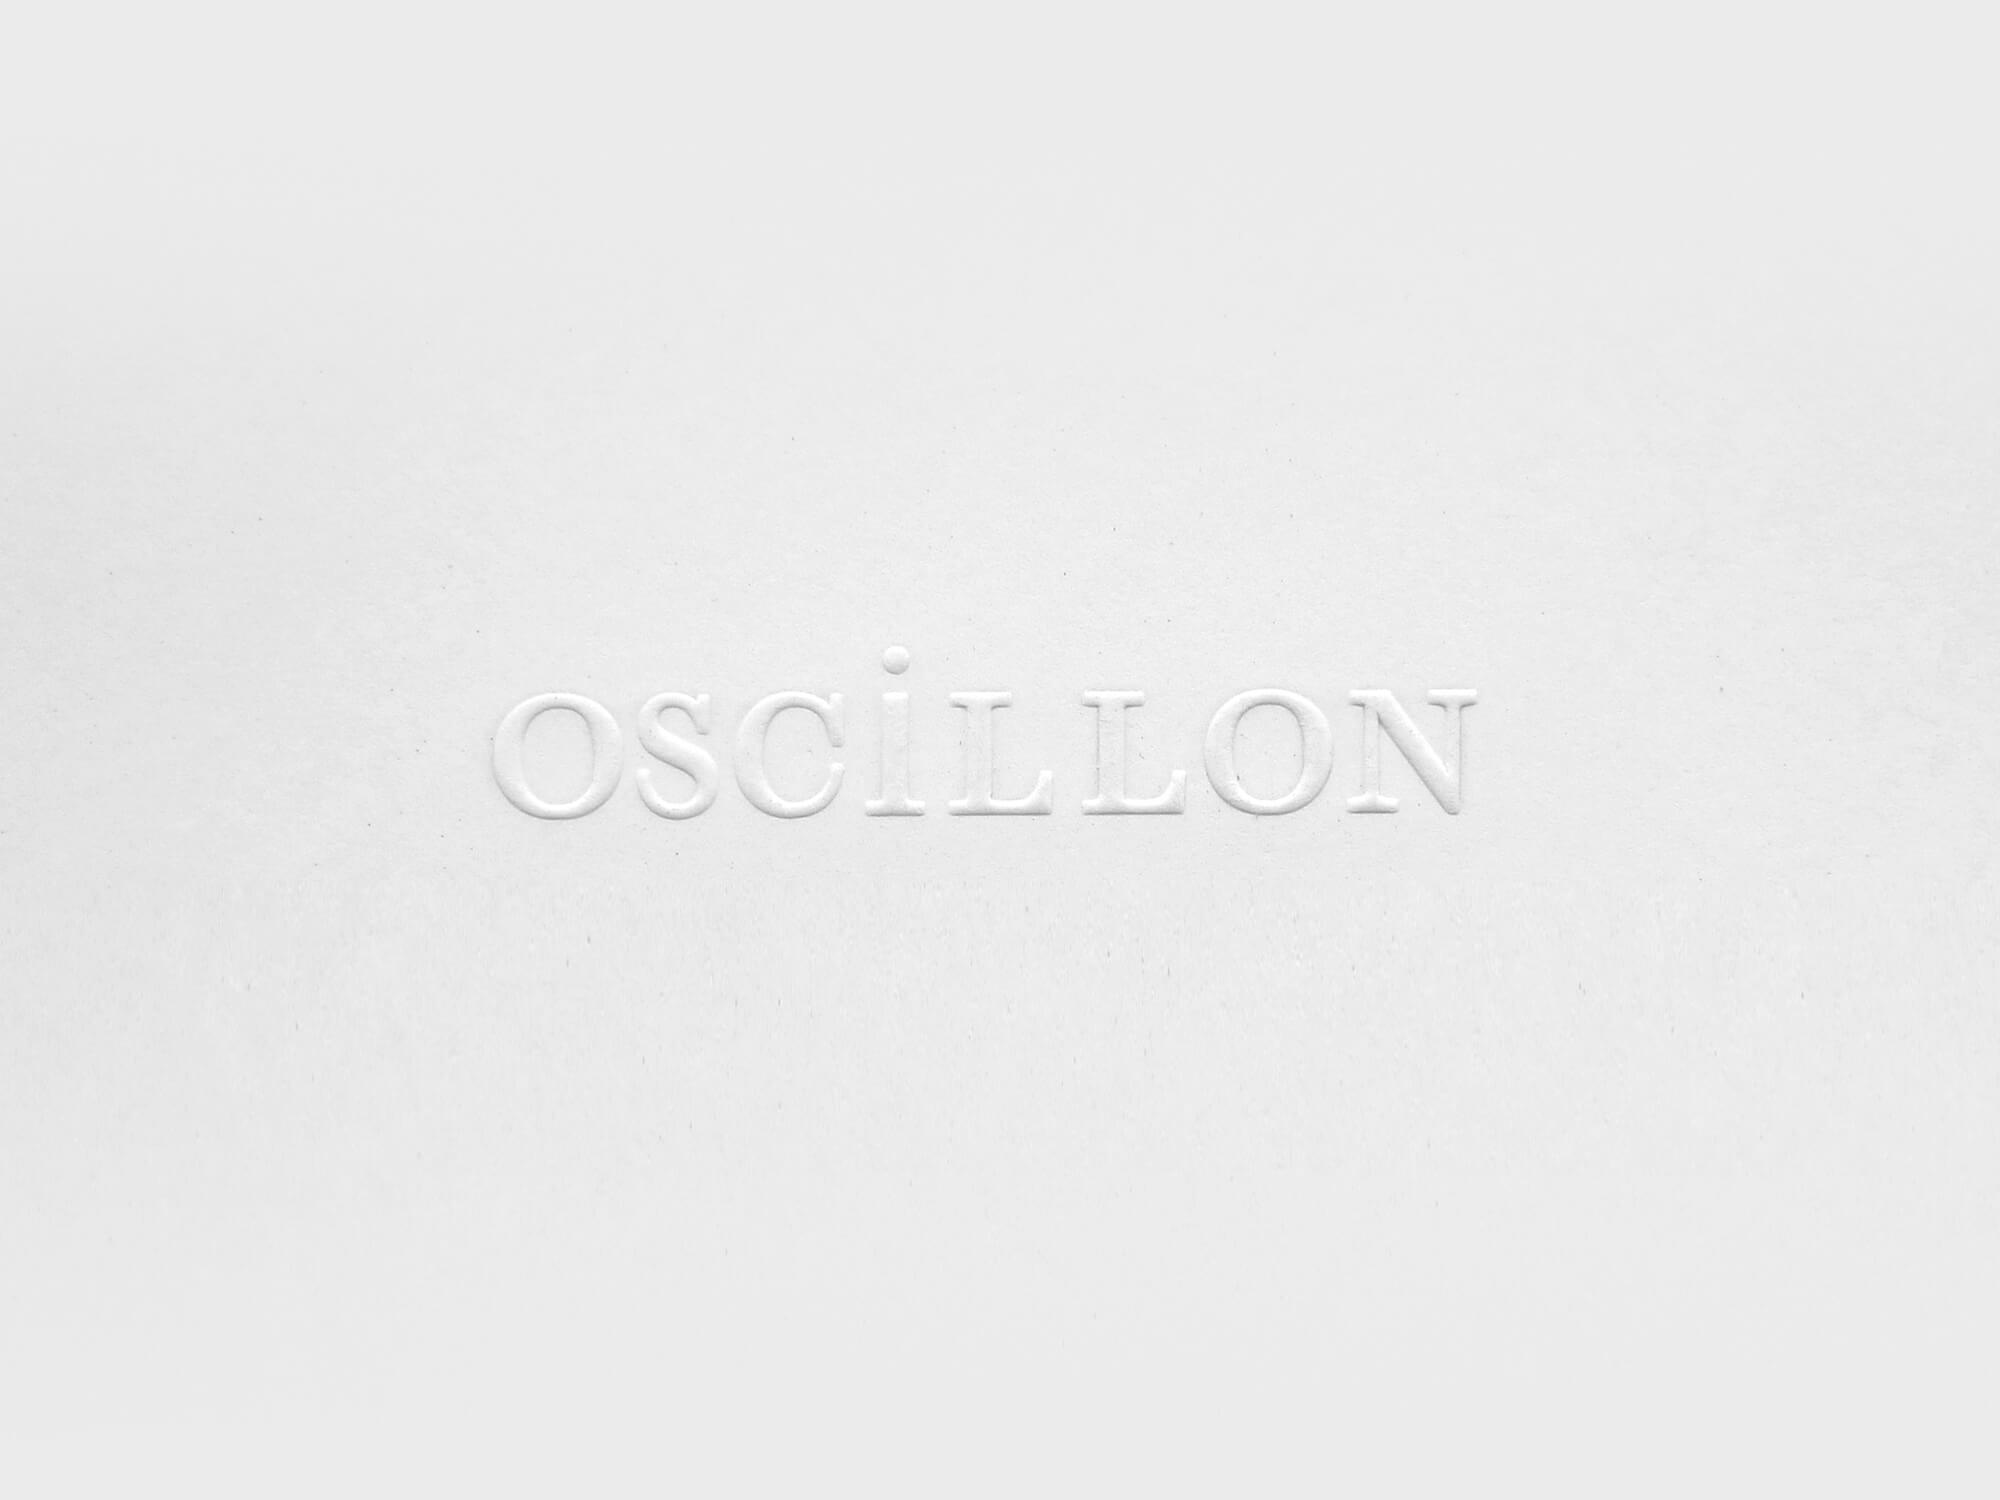 Oscillon_Branding_Kim-Arbenz